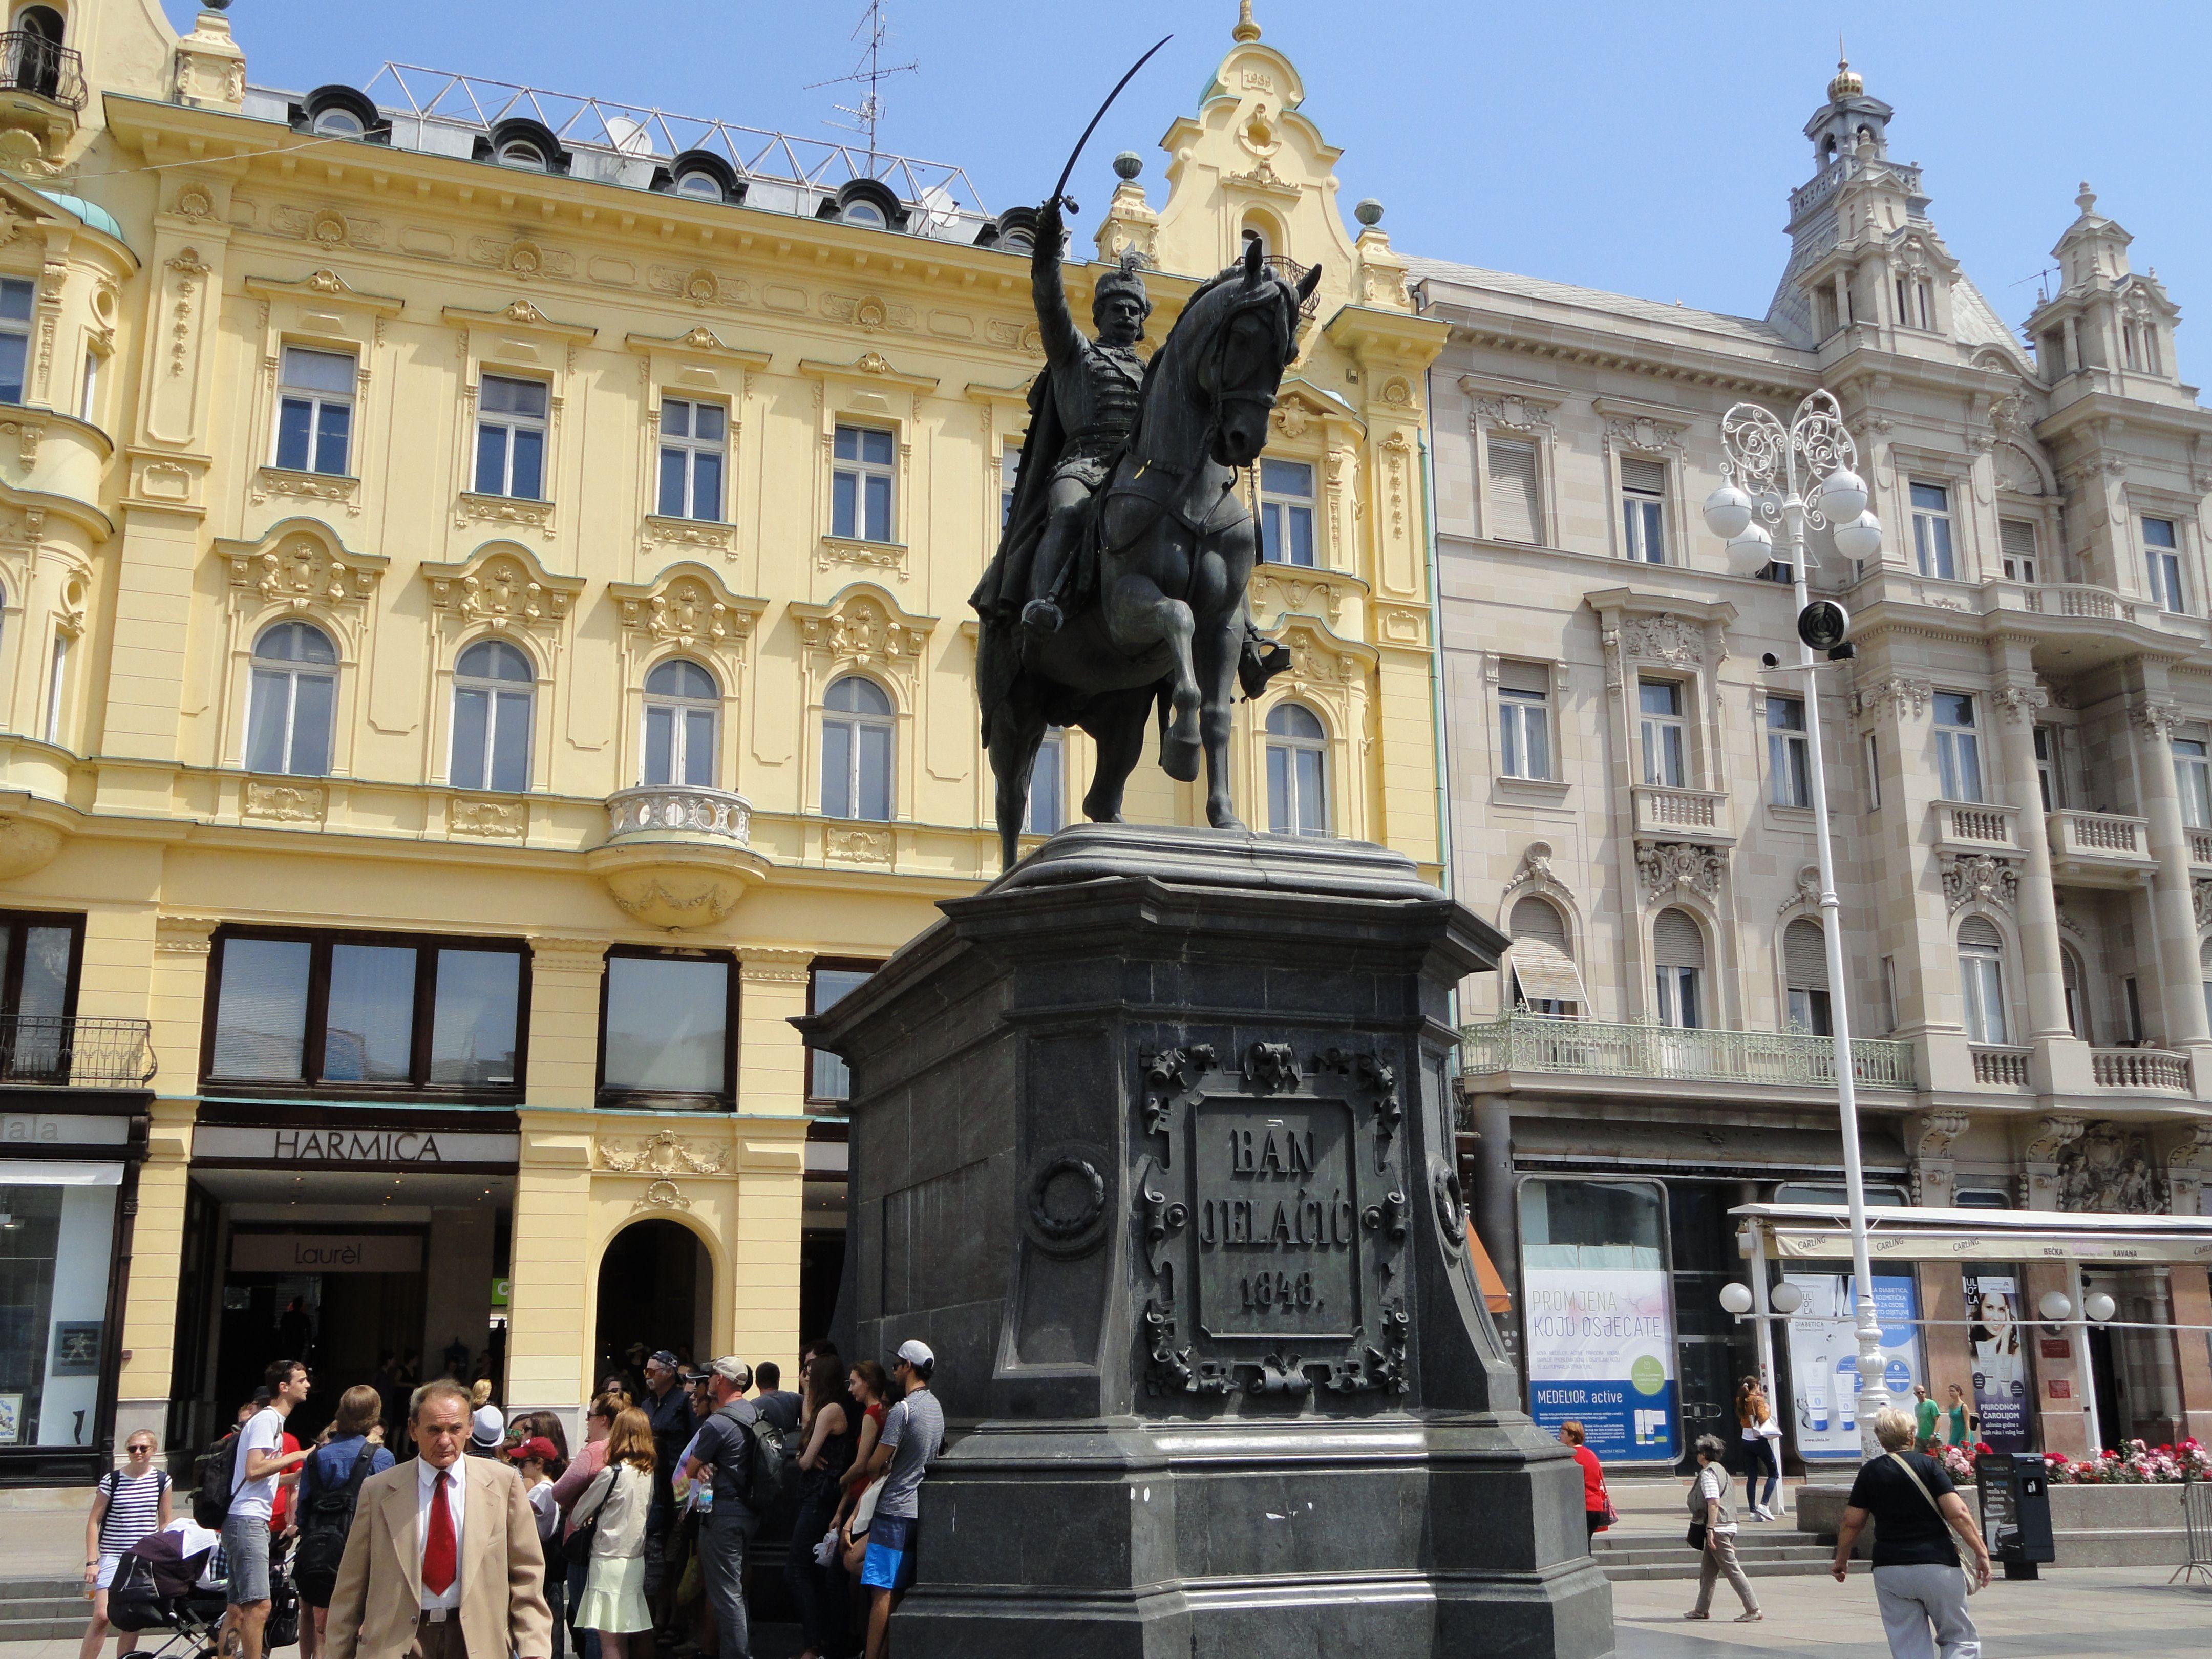 Ban Jelacic Square Zagreb Croatia May 29 2016 Zagreb Croatia Building